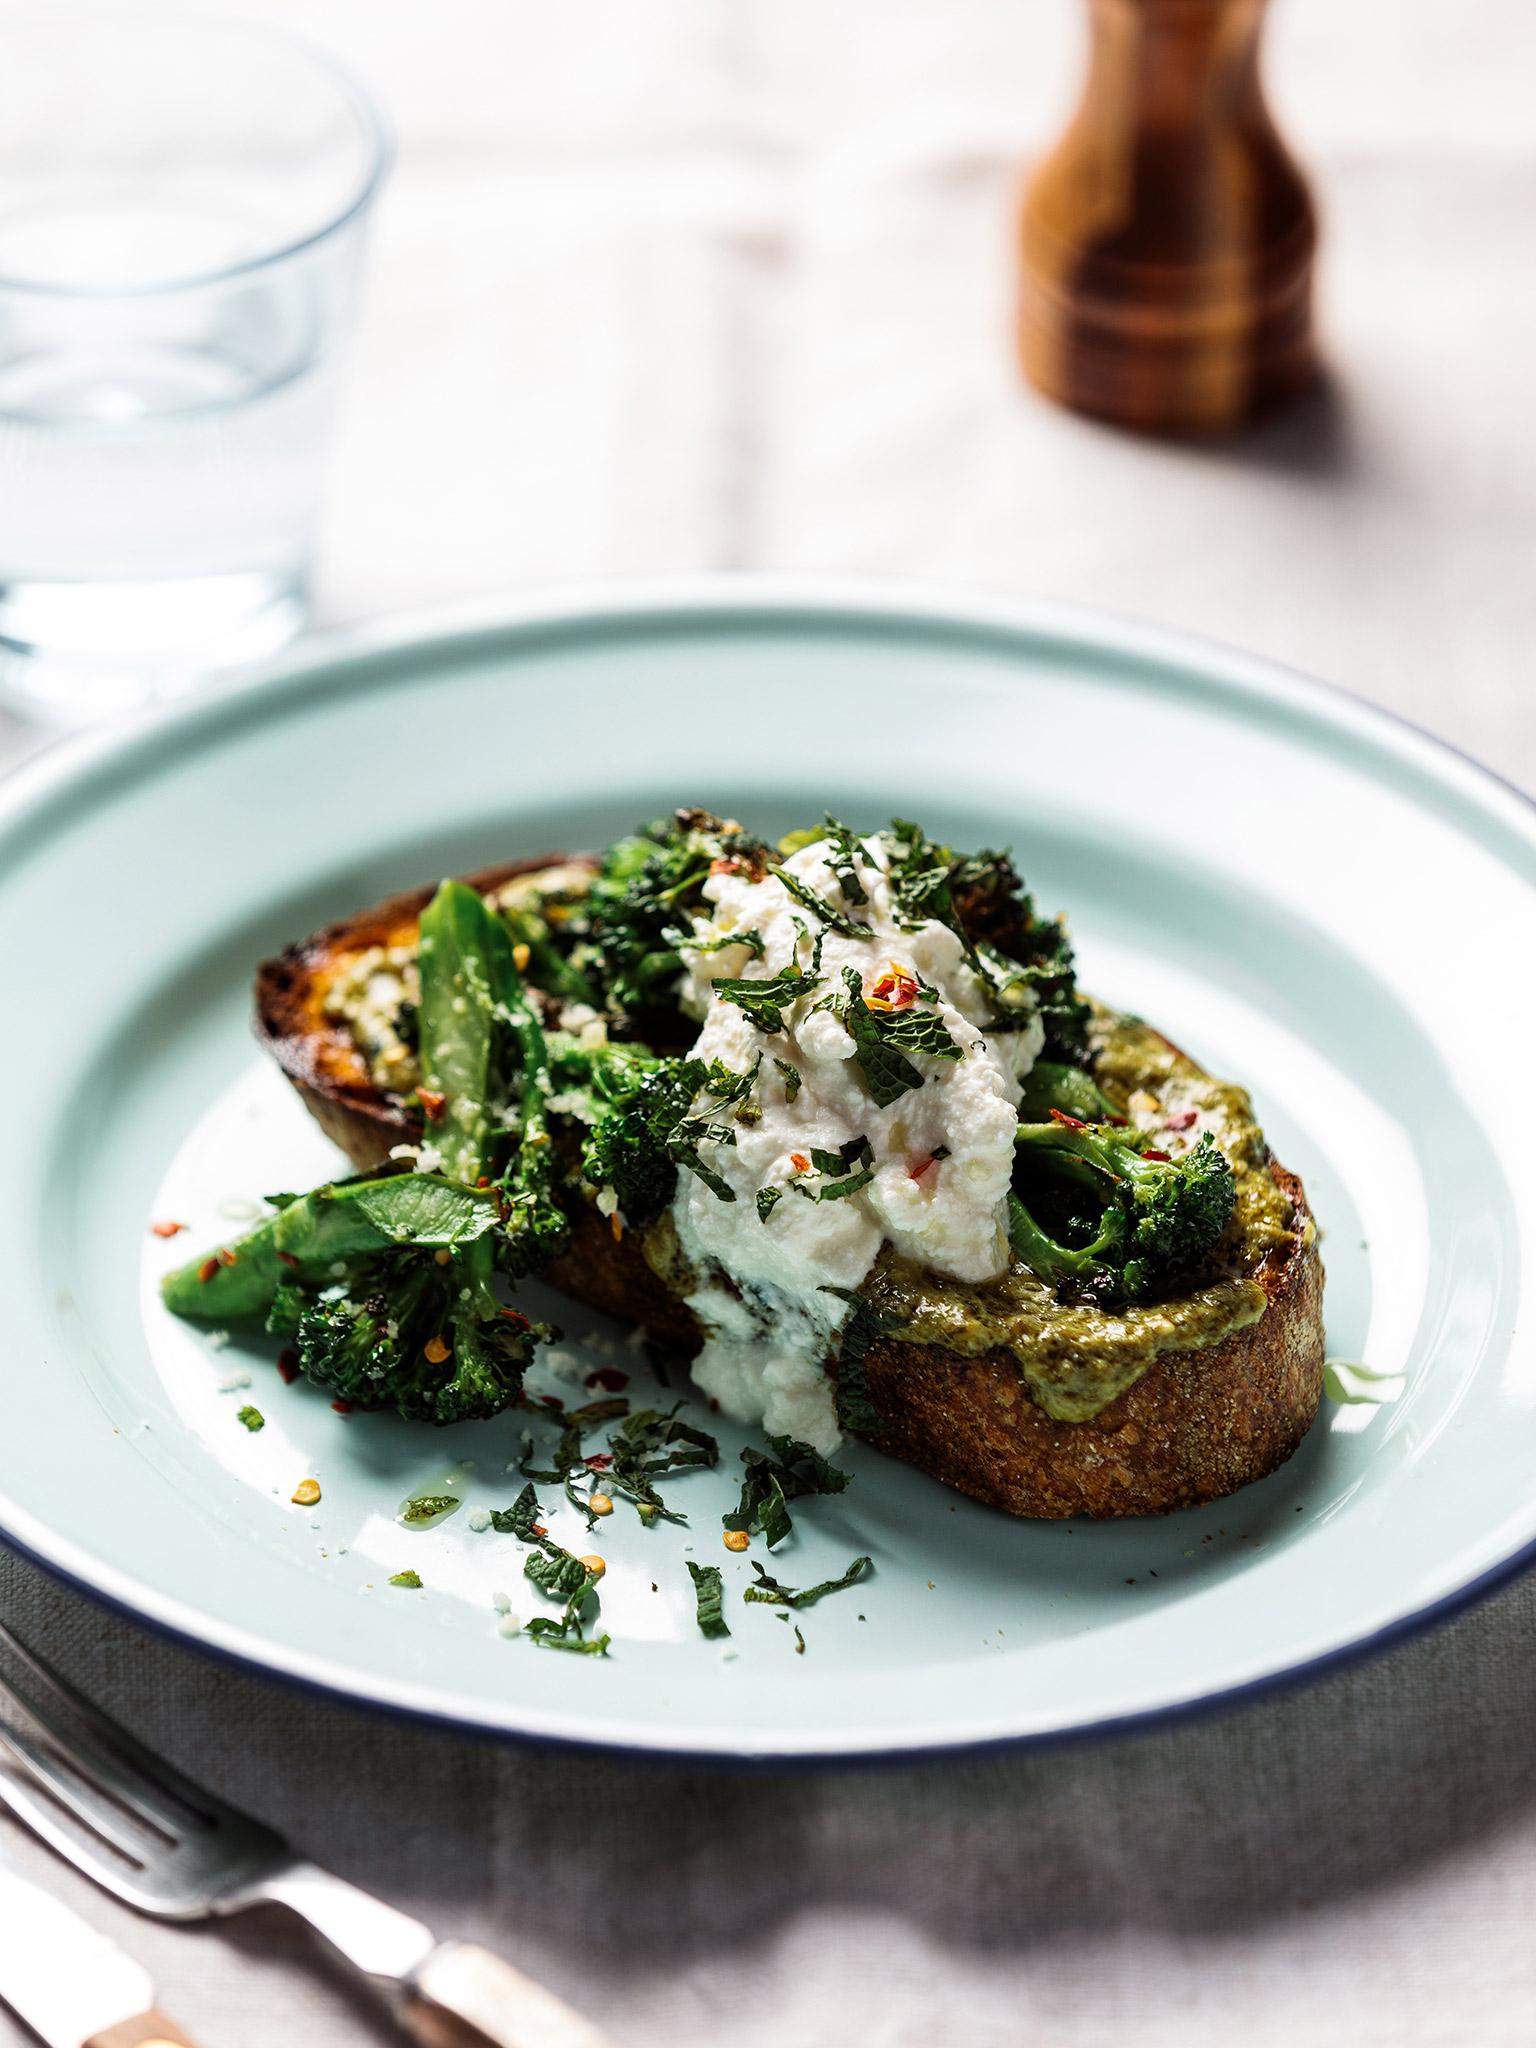 3-118-Barilla-Homemade-Ricotta-with-Greens-on-Toast-web.jpg